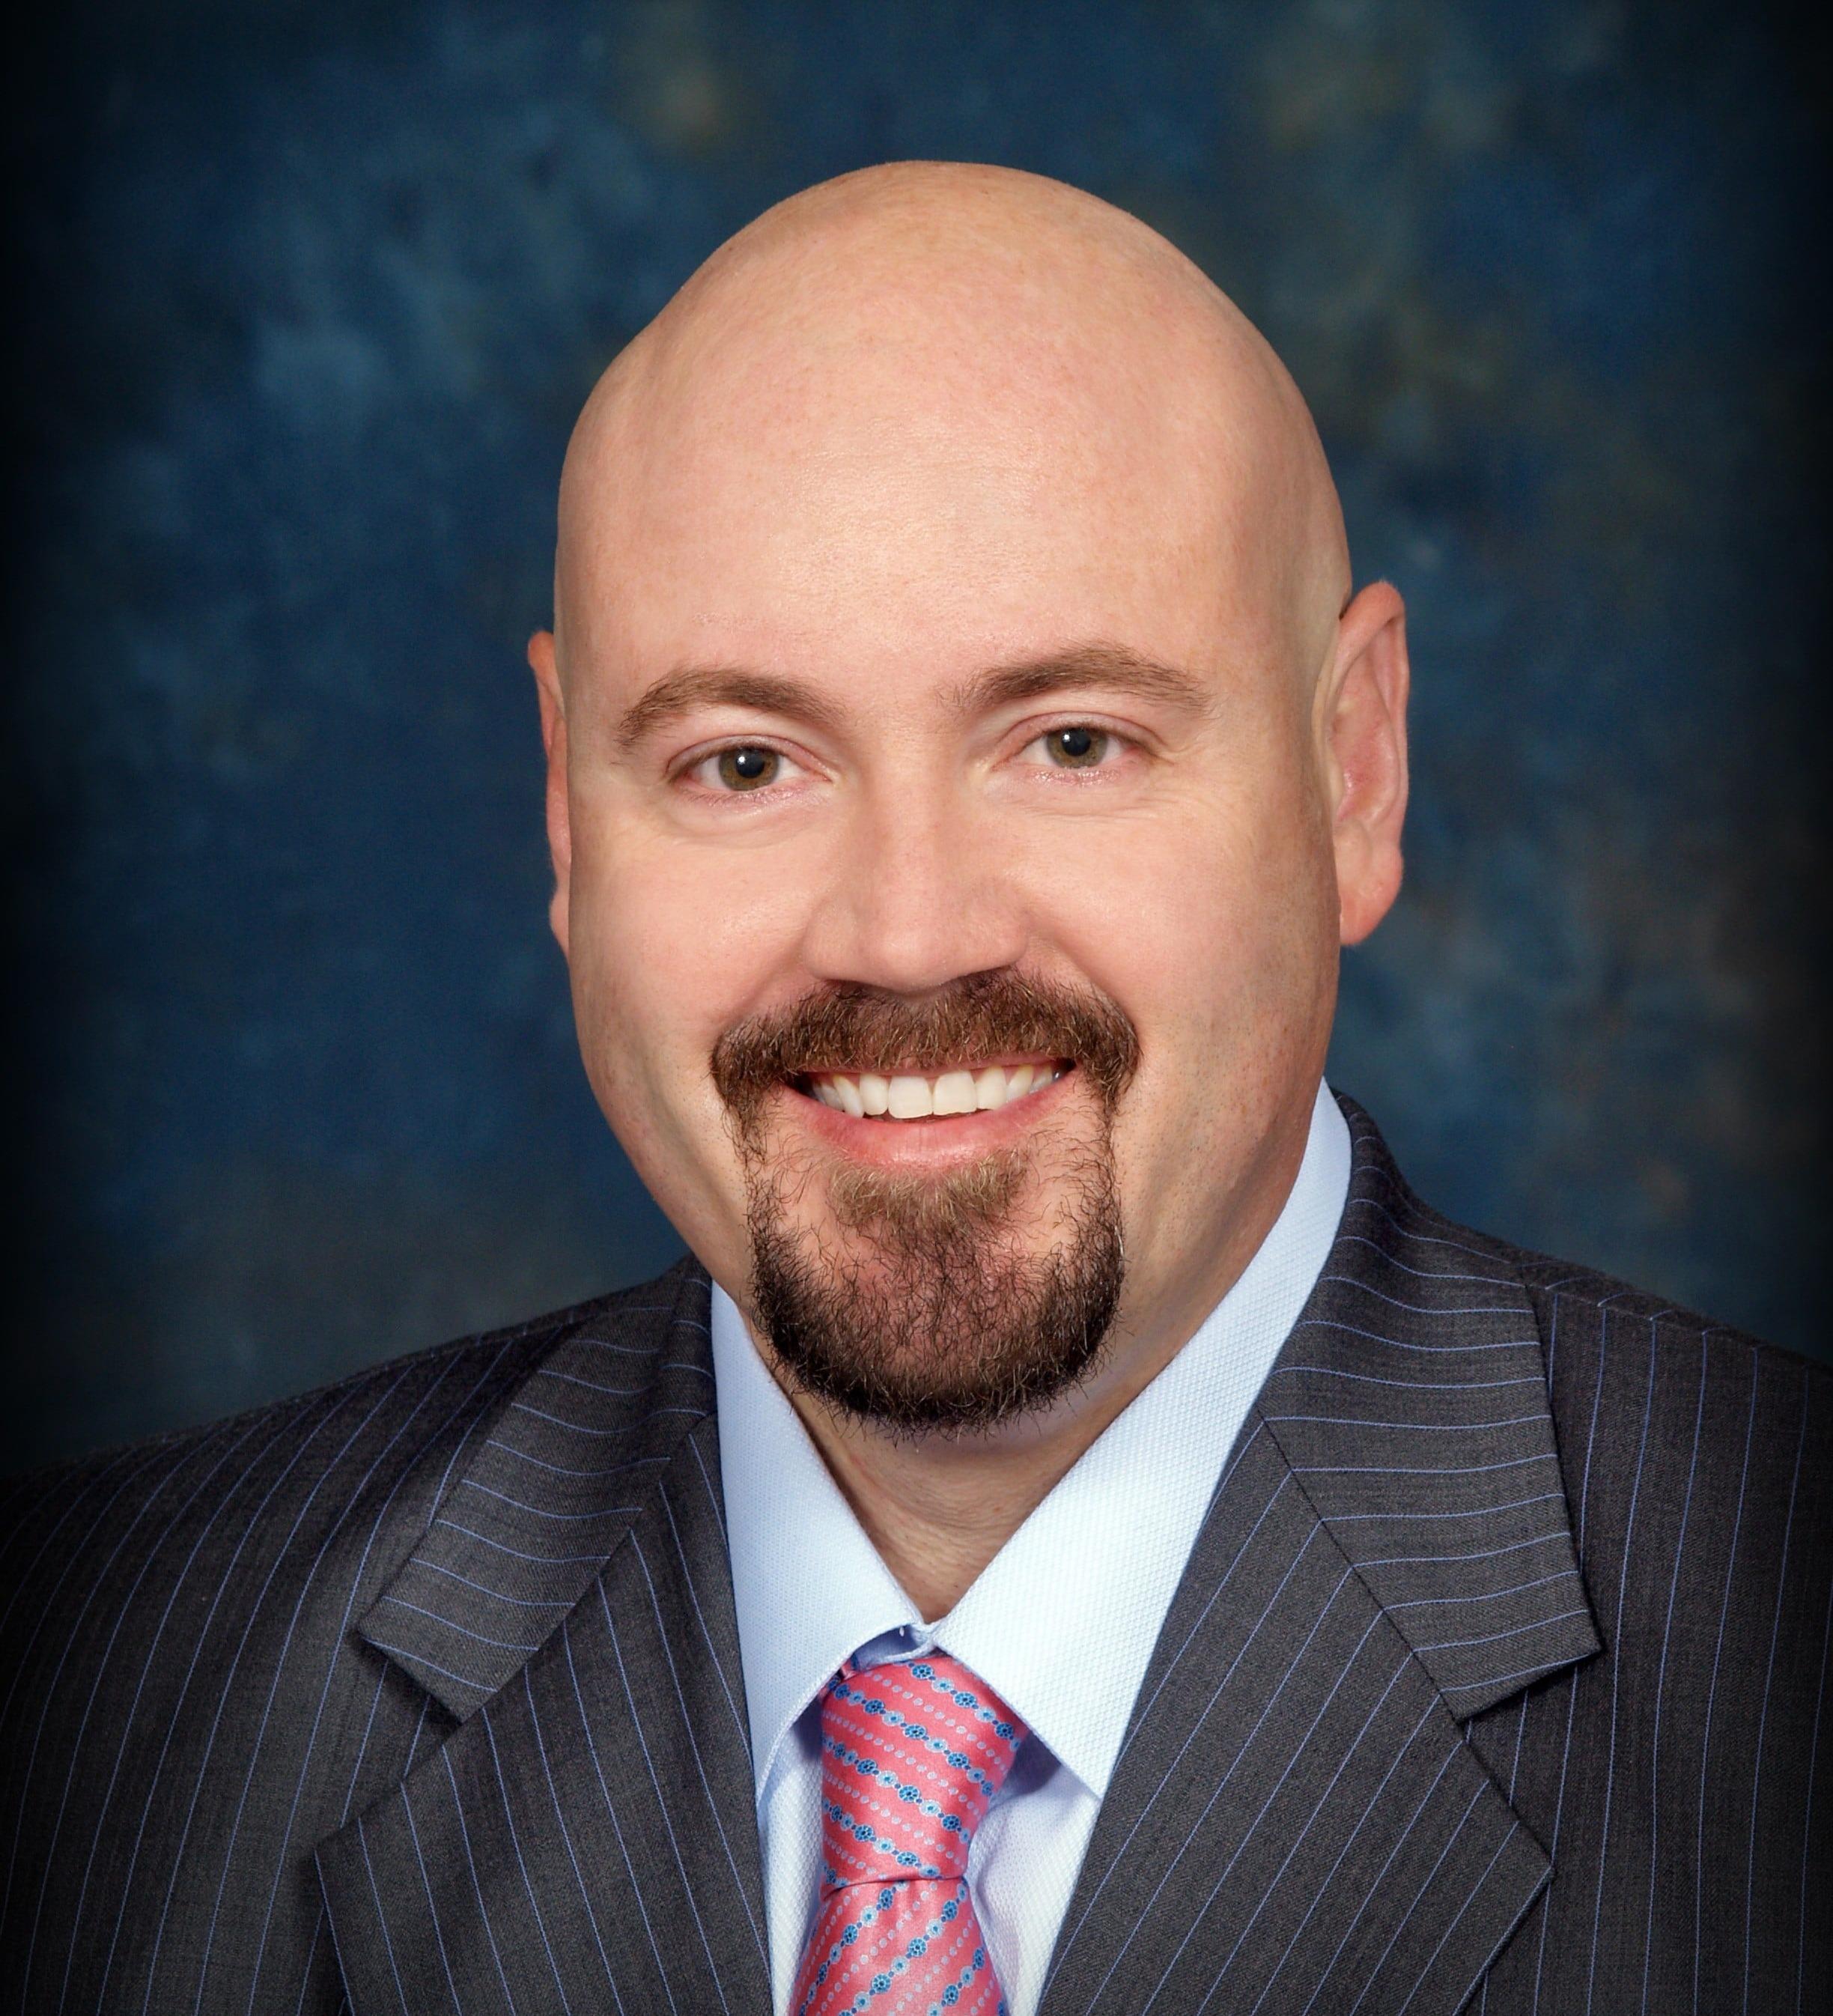 J. Todd Malaise's Profile Image